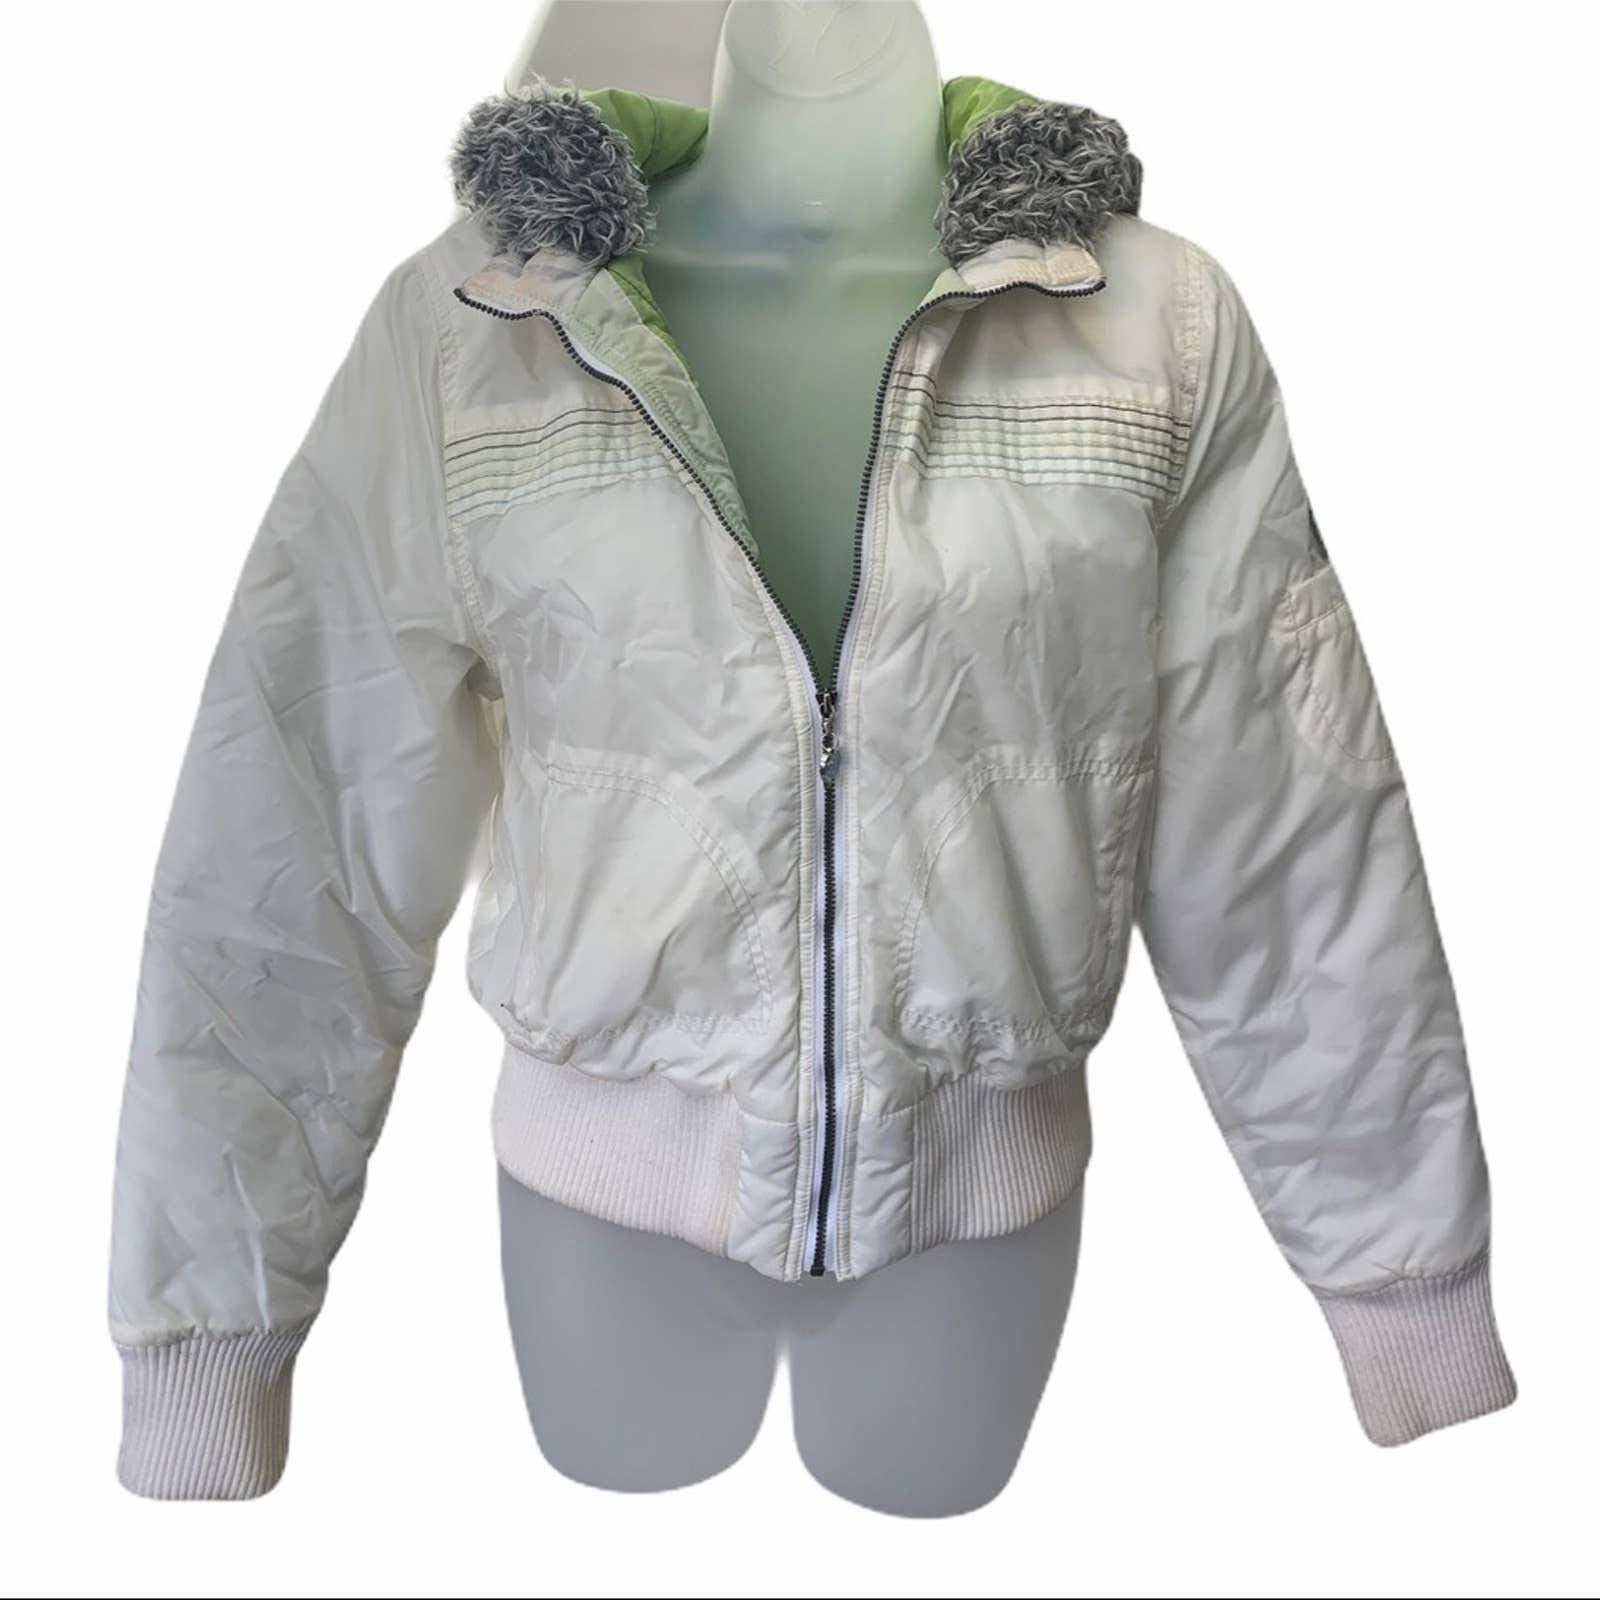 Roxy Full Zip Puffer Jacket White Green